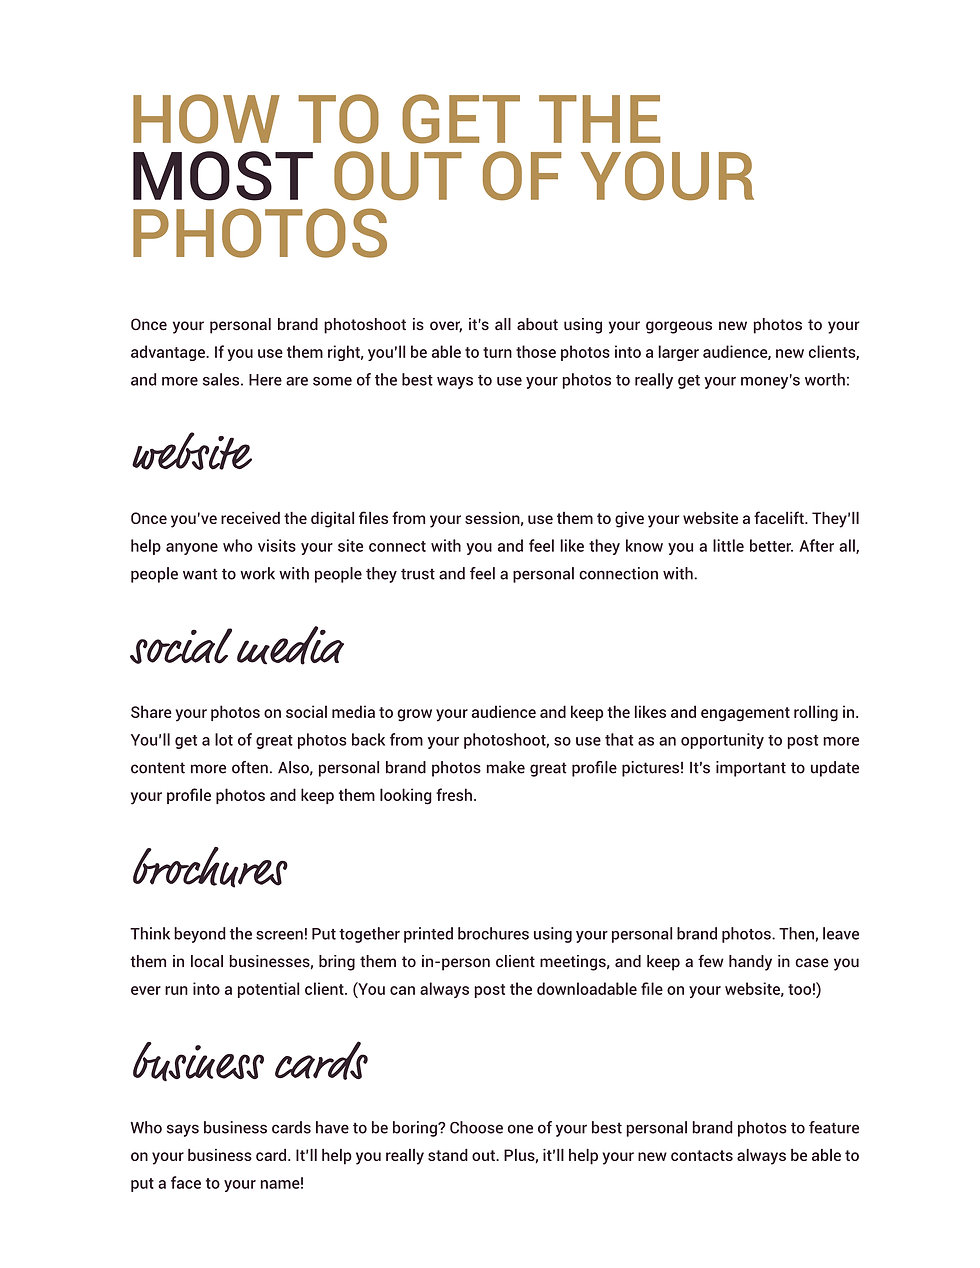 Personal Brand Magazine Vol 2 Page 14 co